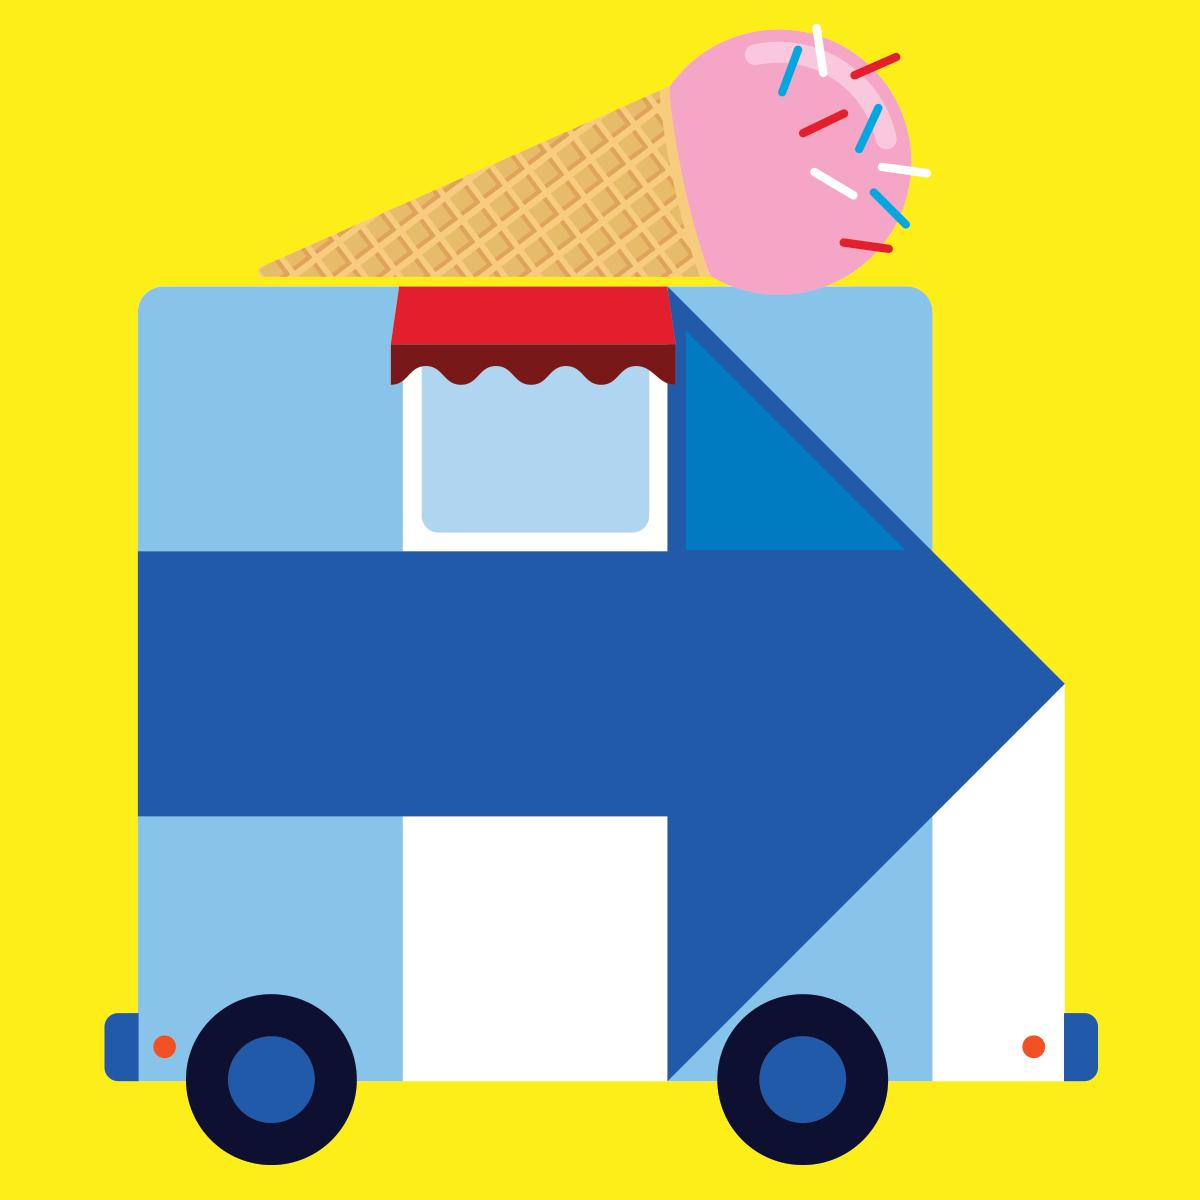 Ice-cream-H-072316.png